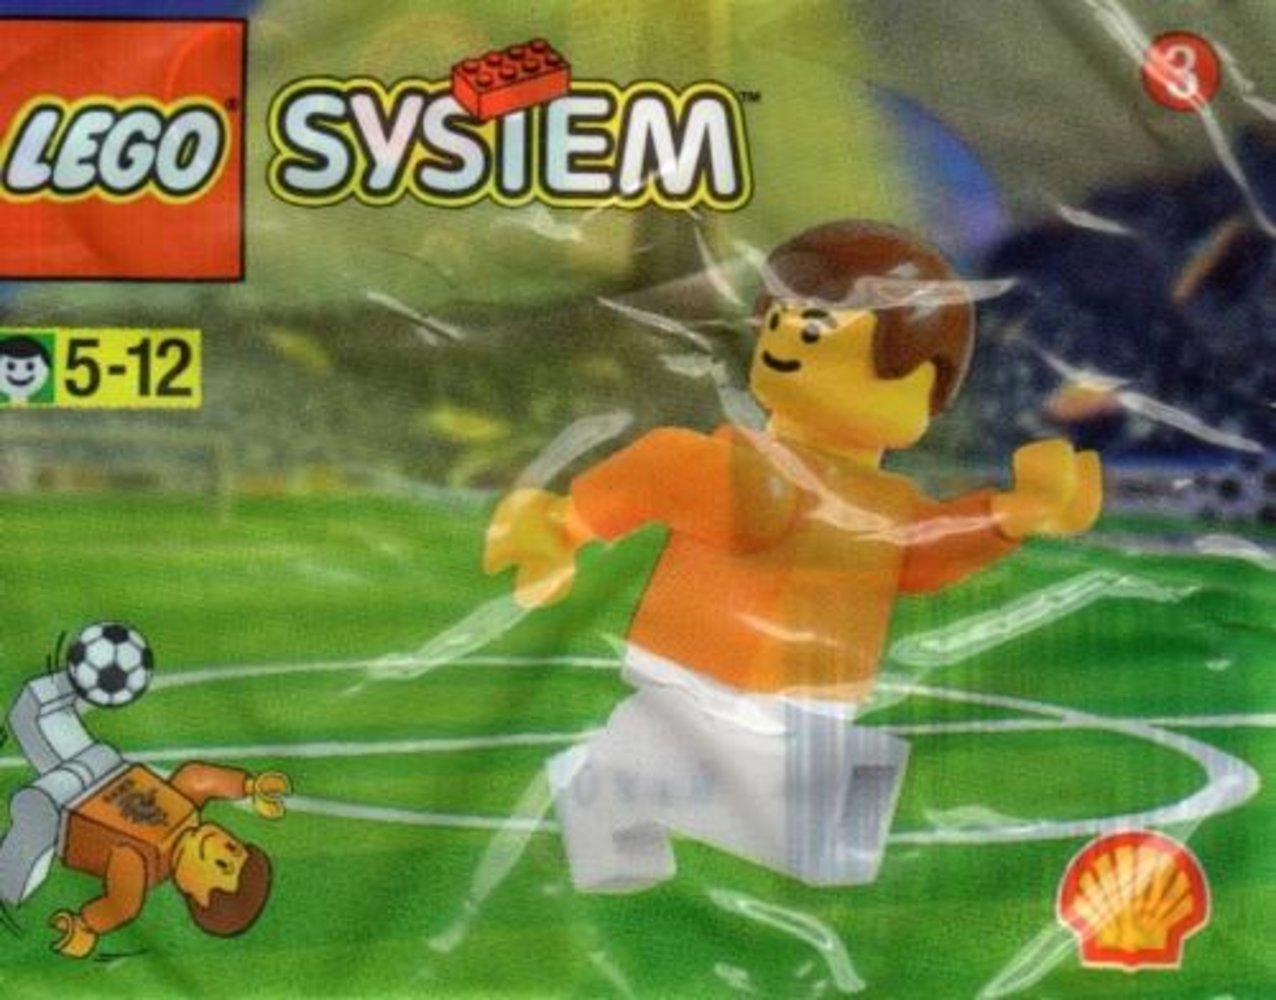 Dutch National Player